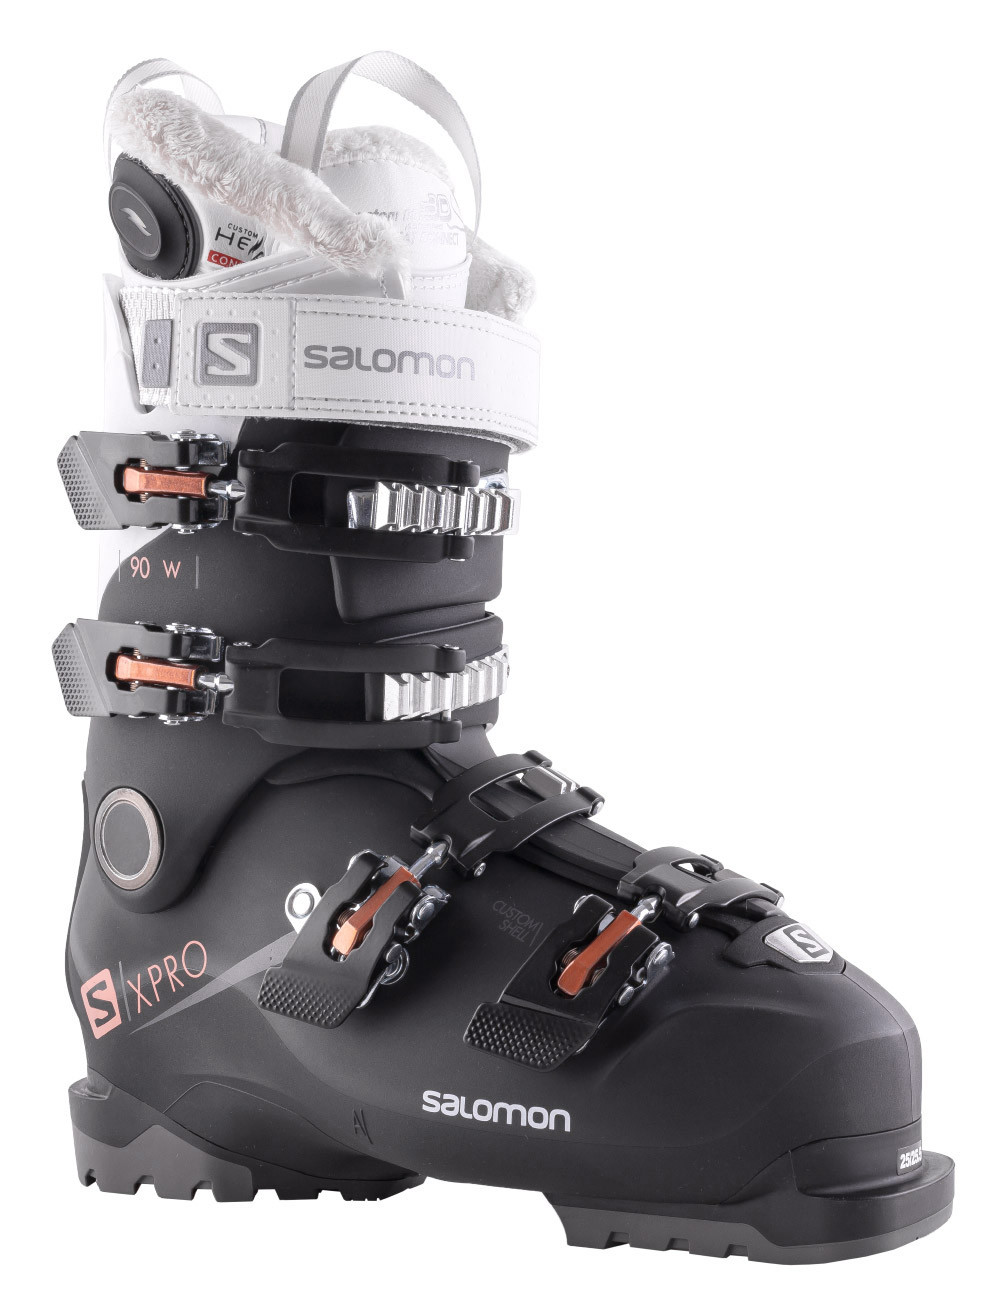 Buty narciarskie Salomon PRO MODEL